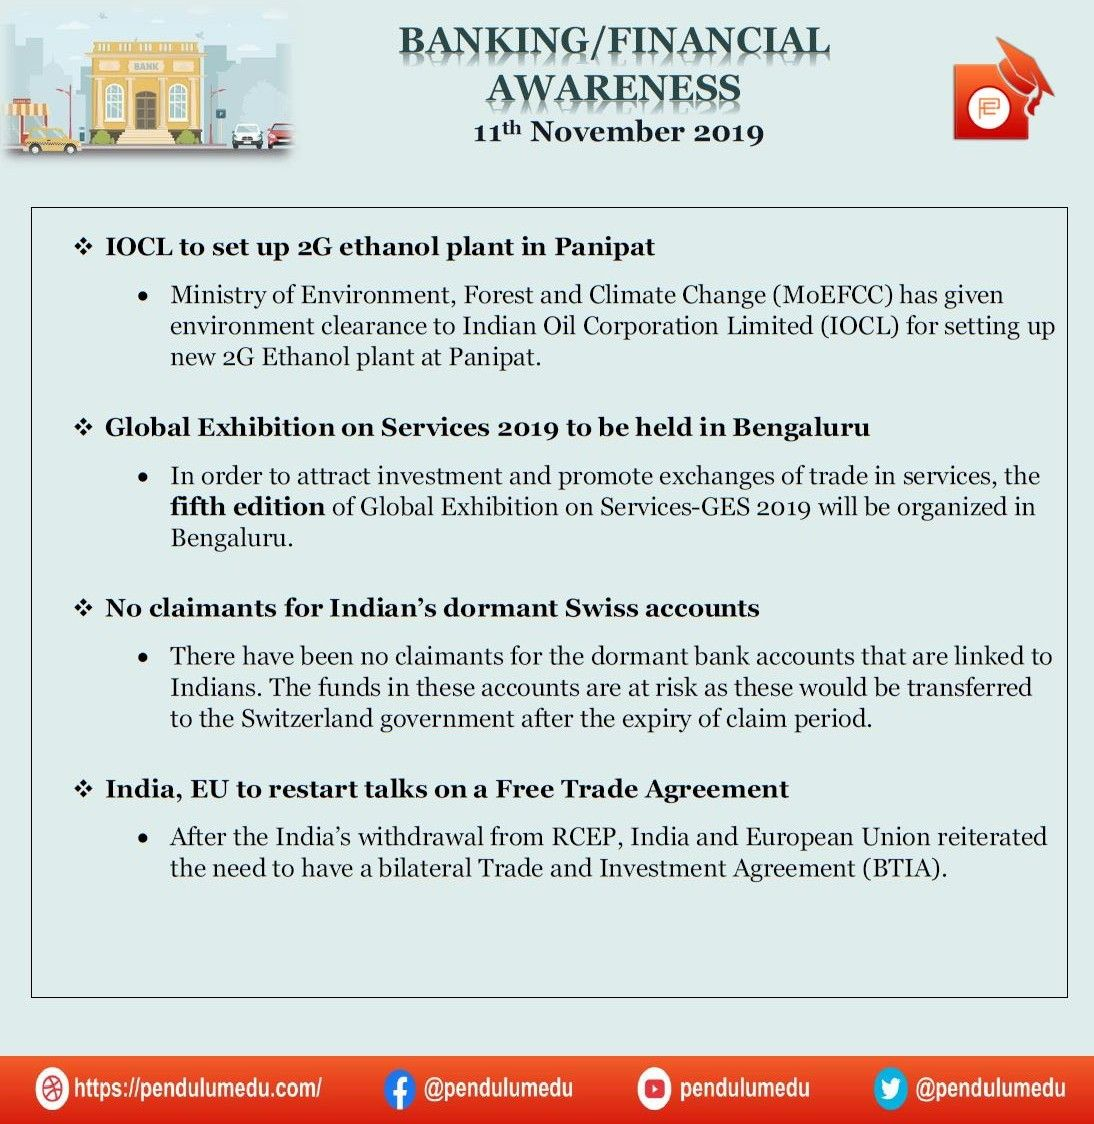 Economic Banking And Financial Awareness Awareness Banking